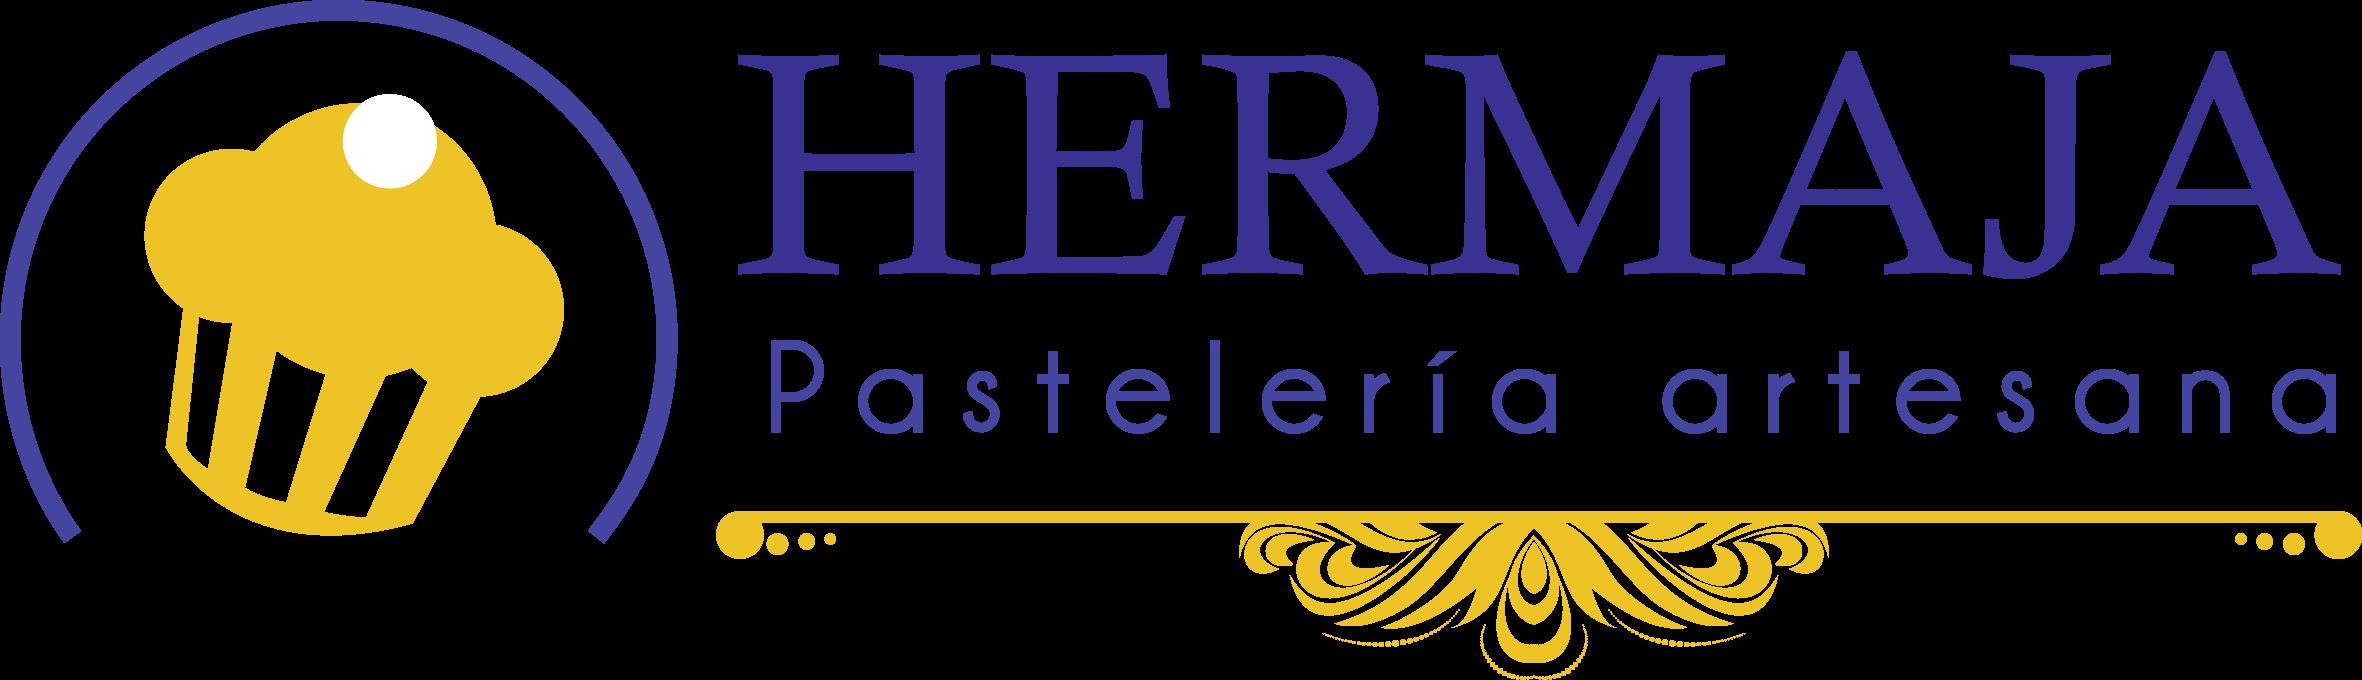 Logotipo Hermaja - Pastelería artesana